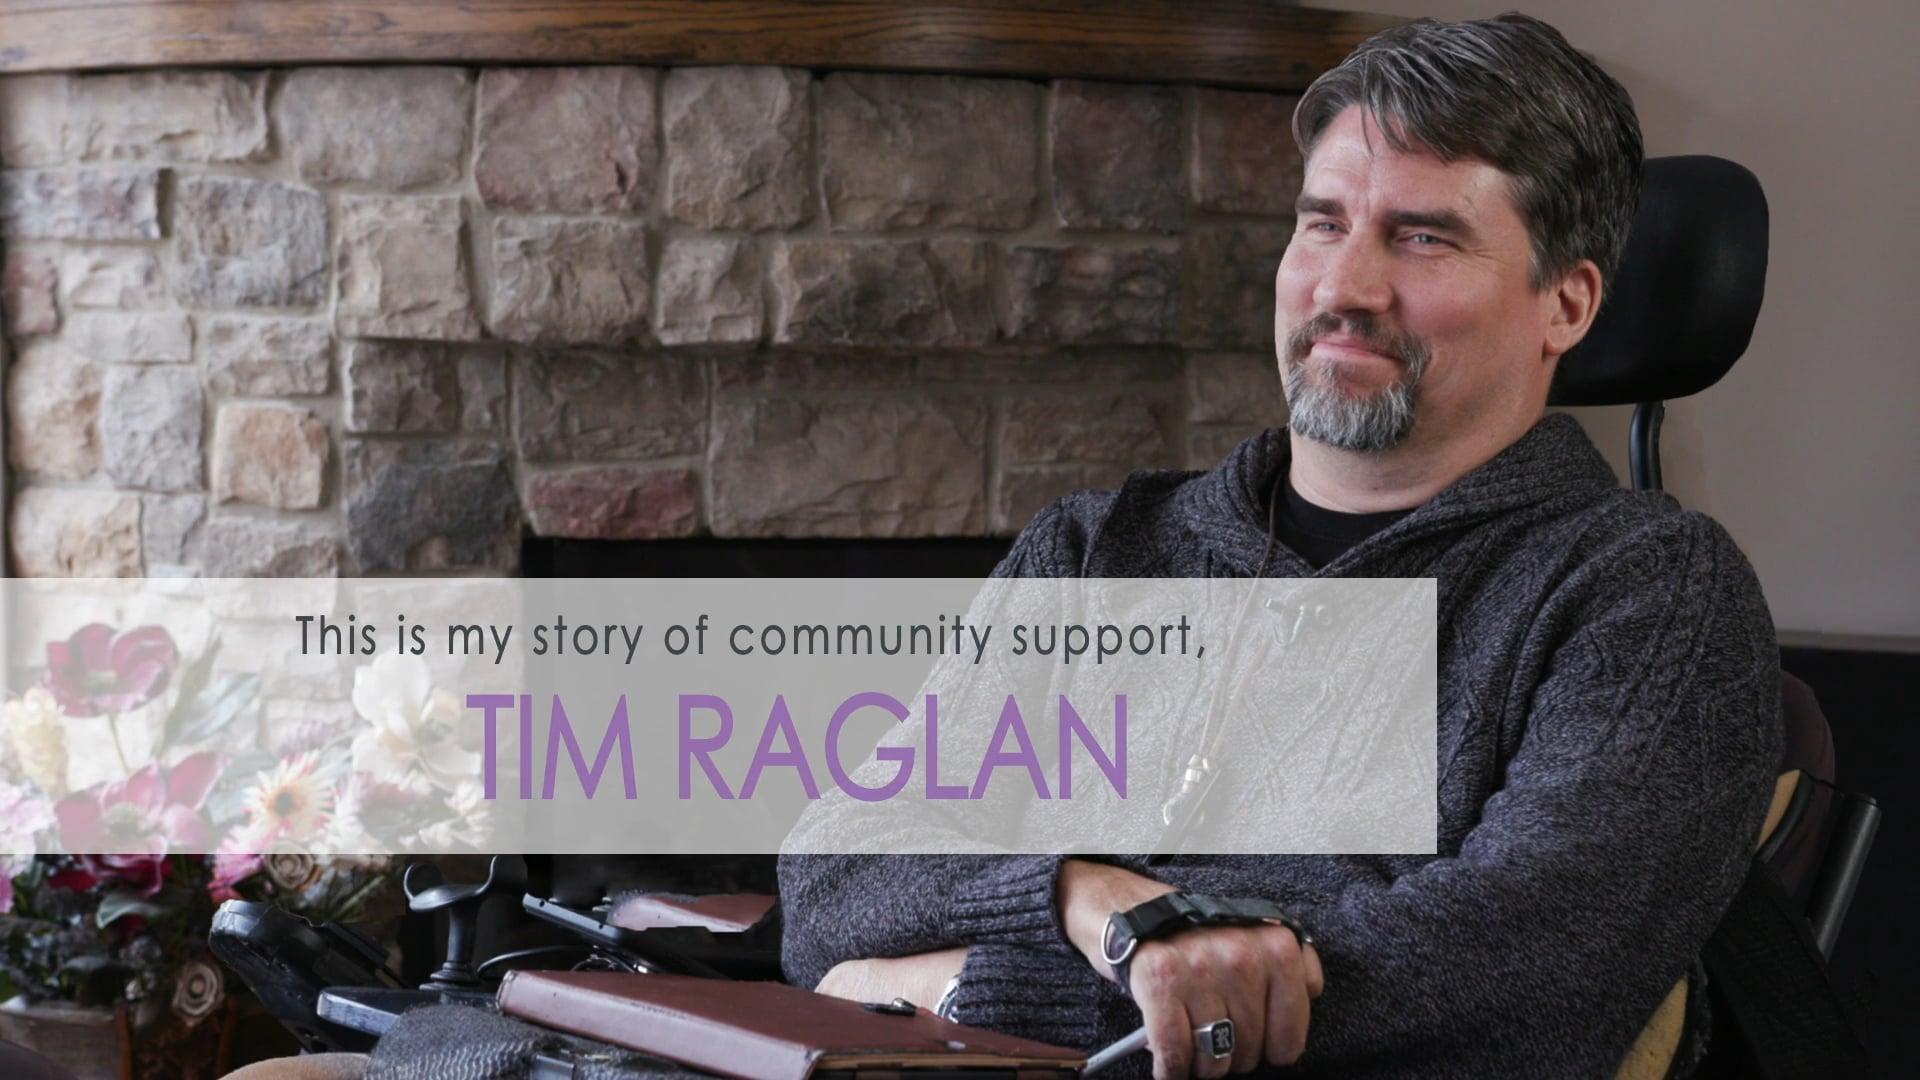 Tim's Story